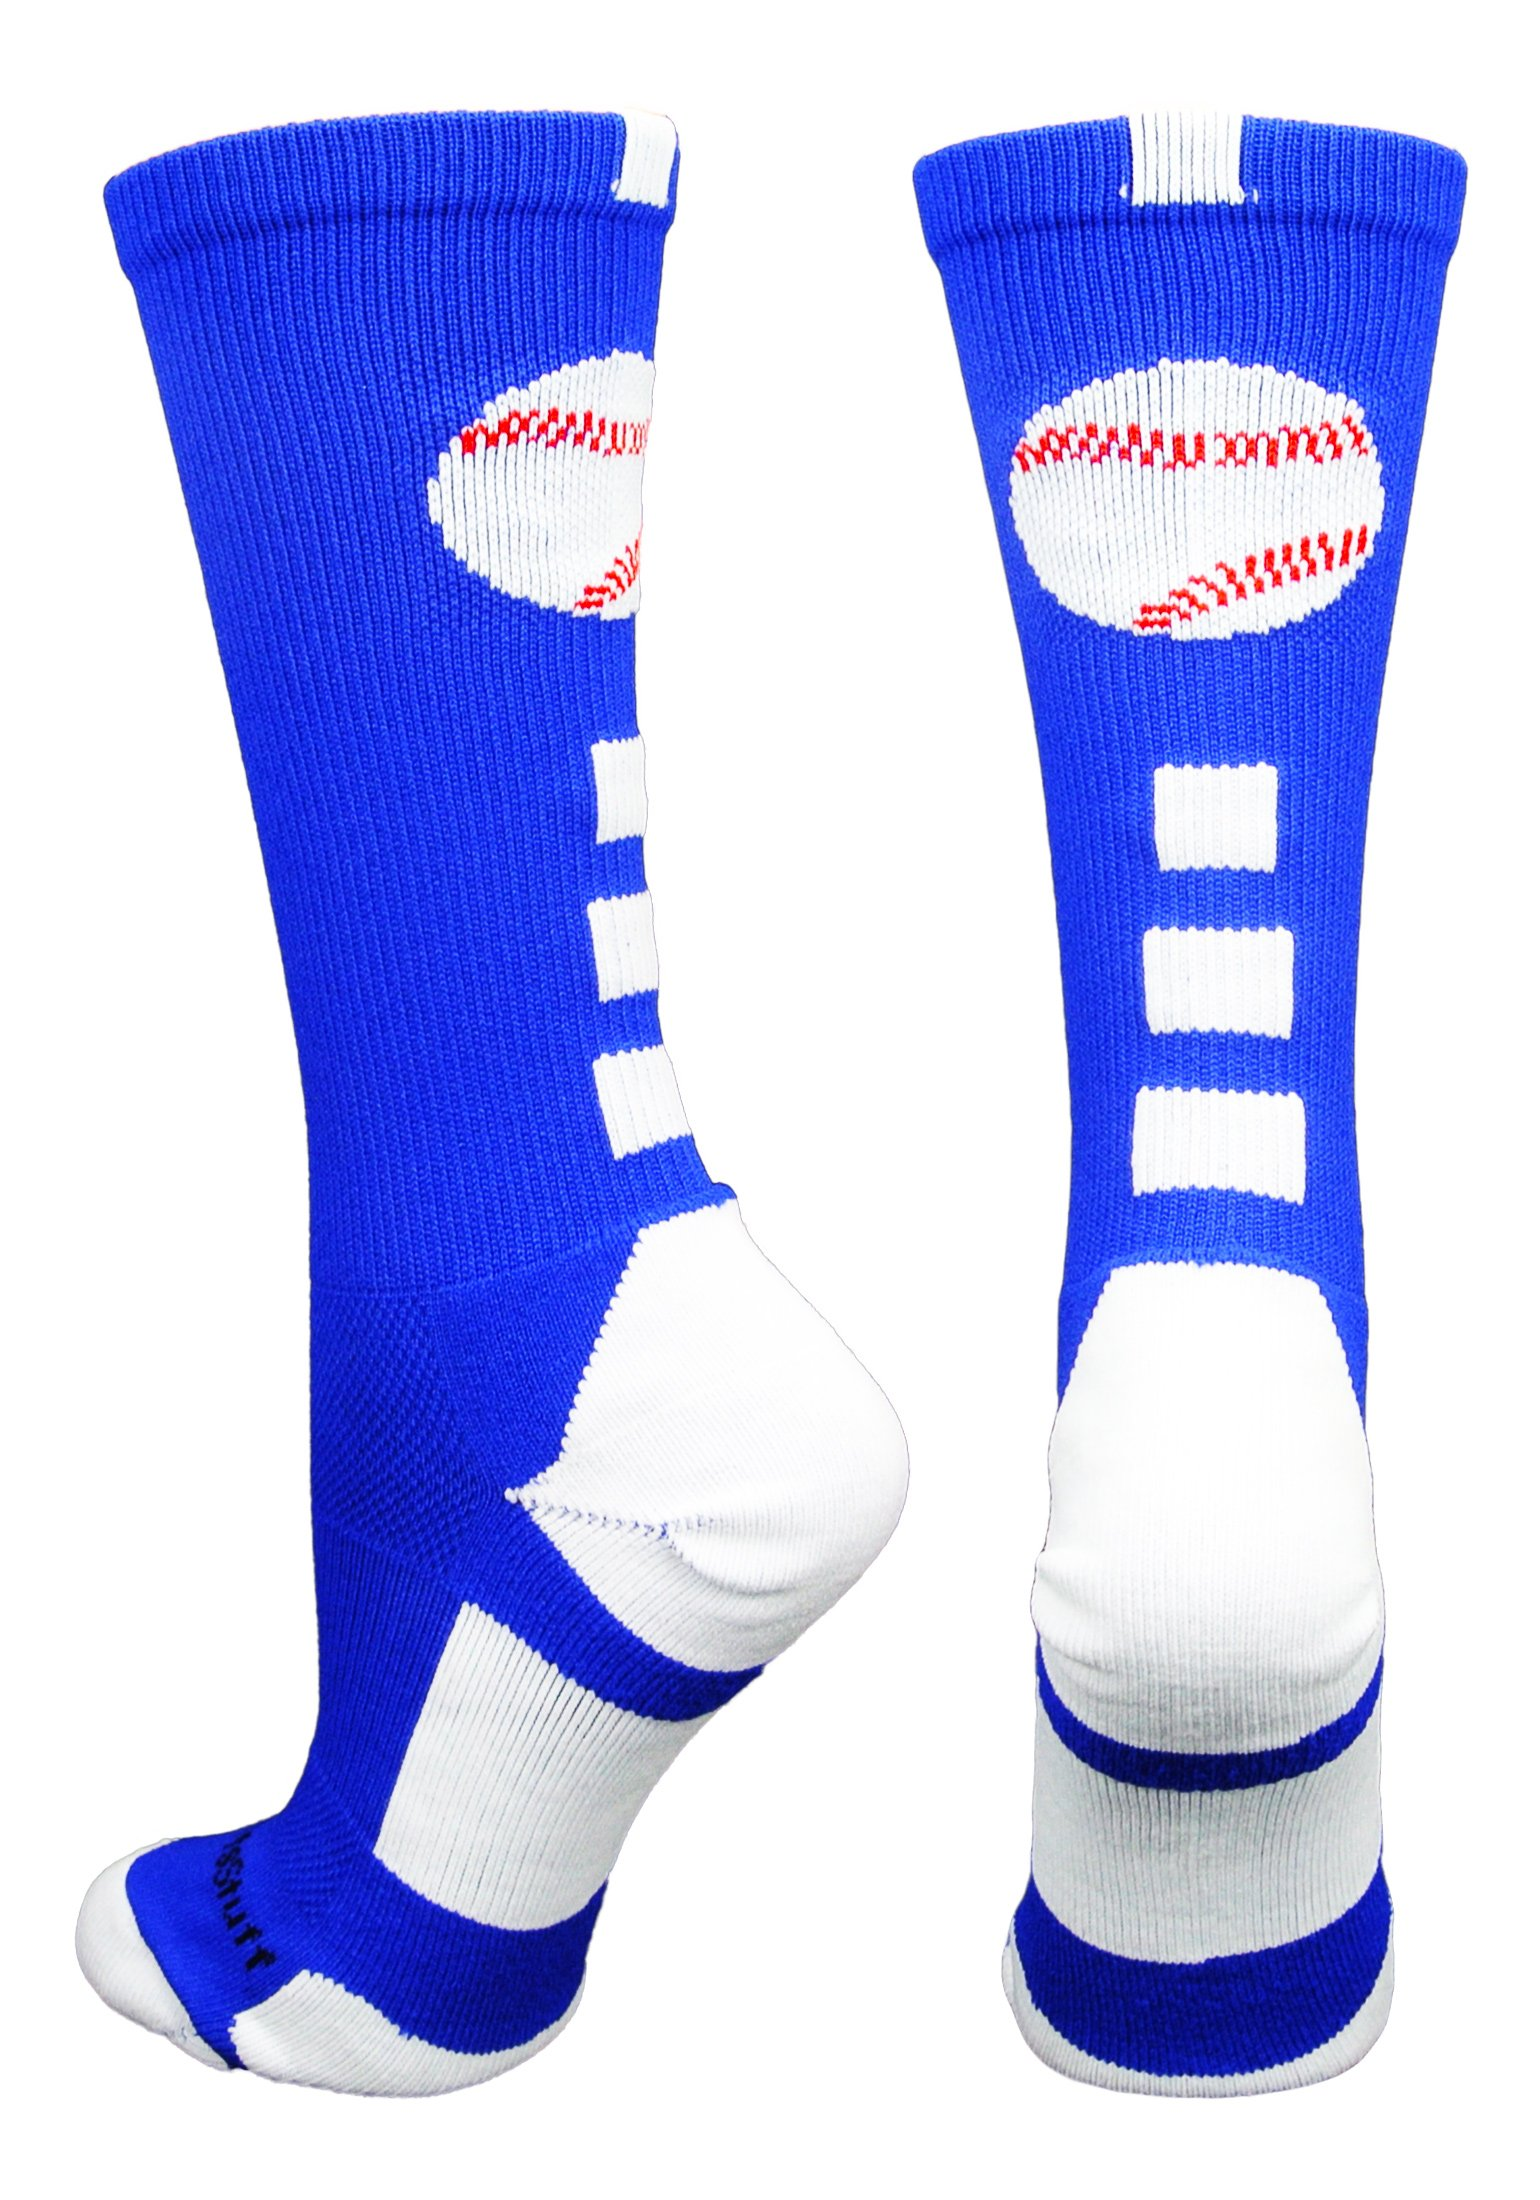 MadSportsStuff Baseball Logo Crew Socks (Royal/White, Large) by MadSportsStuff